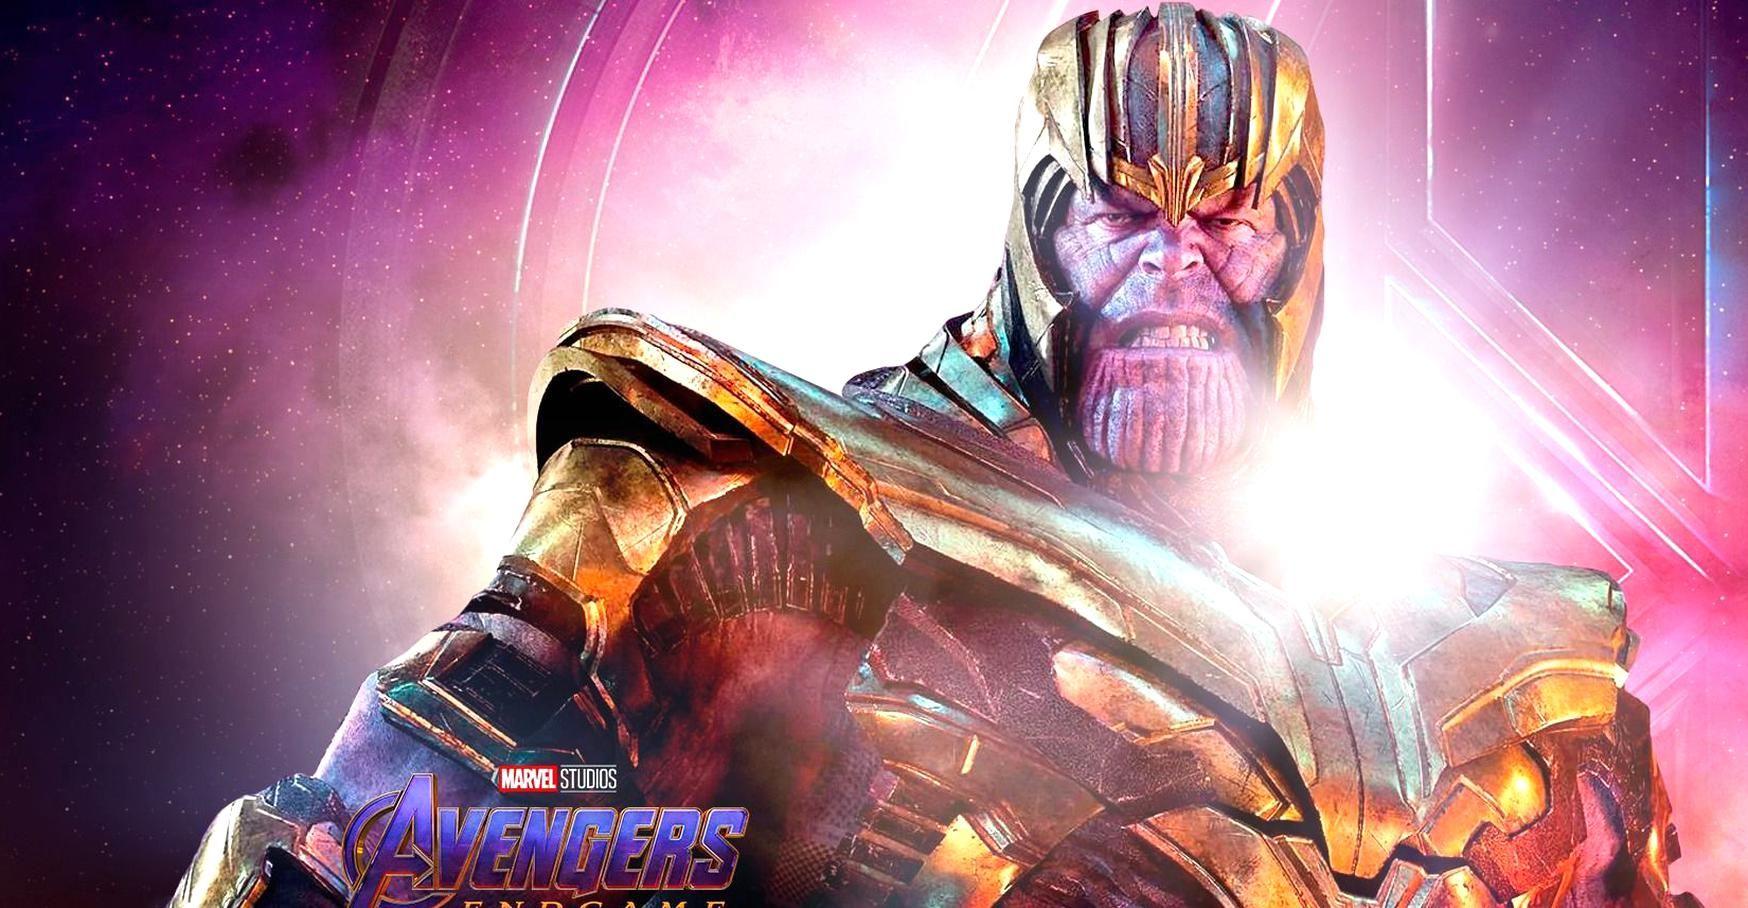 New Avengers Endgame Ultra Hd Desktop Wallpapers Images Avengers Endgame Thanos Wallpapers 4k Ultra Desktop Movies 1080p Battle Marvel Deviantart Background La V 2020 G